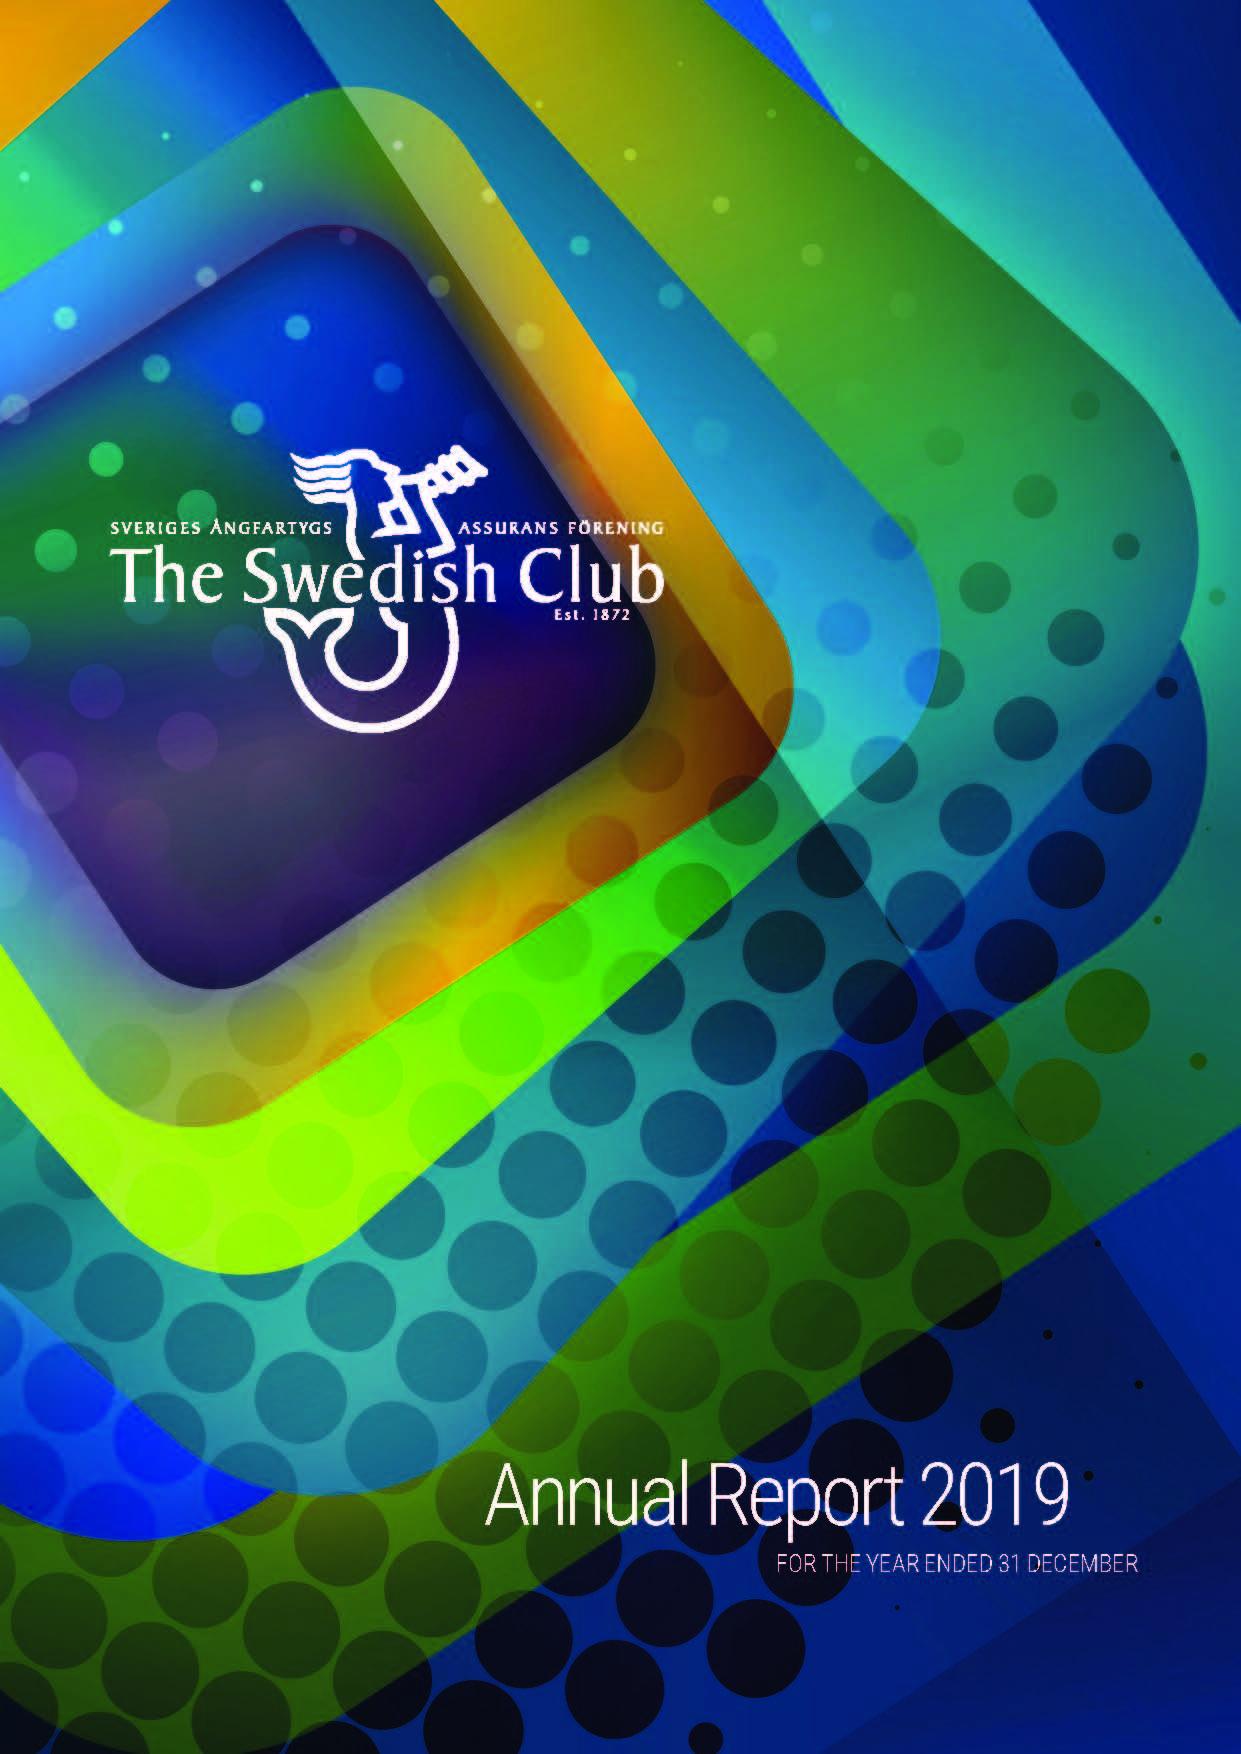 The Swedish Club's Annual Report 2019